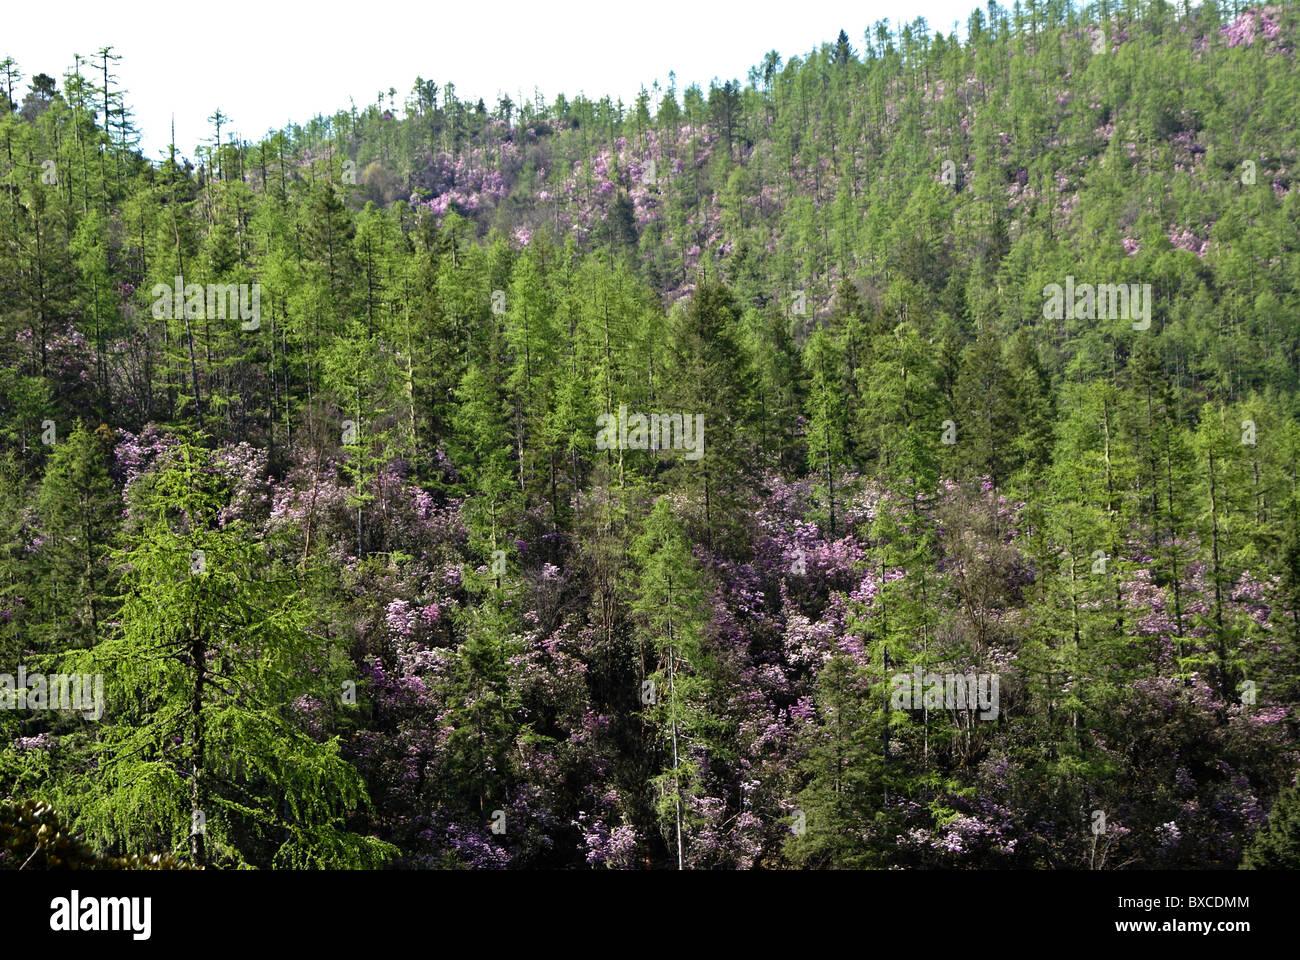 Evergreens and blooming rhododendron, Shangri-la, Yunnan, China - Stock Image